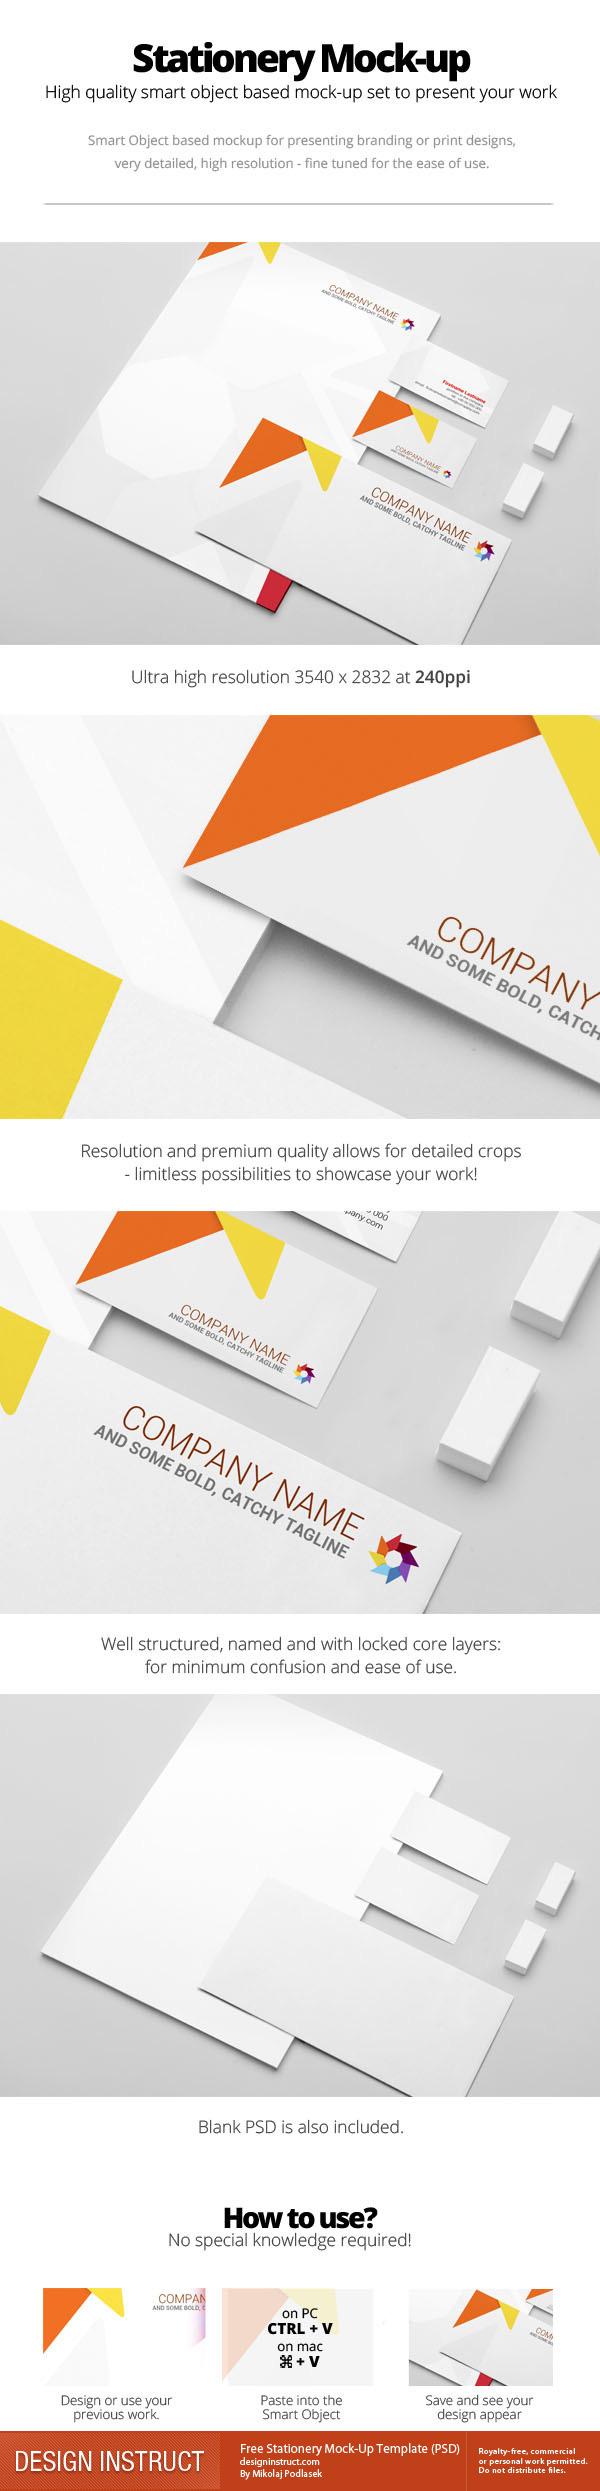 Mockup mock up mock-up stationery mockup stationery mock-up presentation portfolio Stationery branding mockup